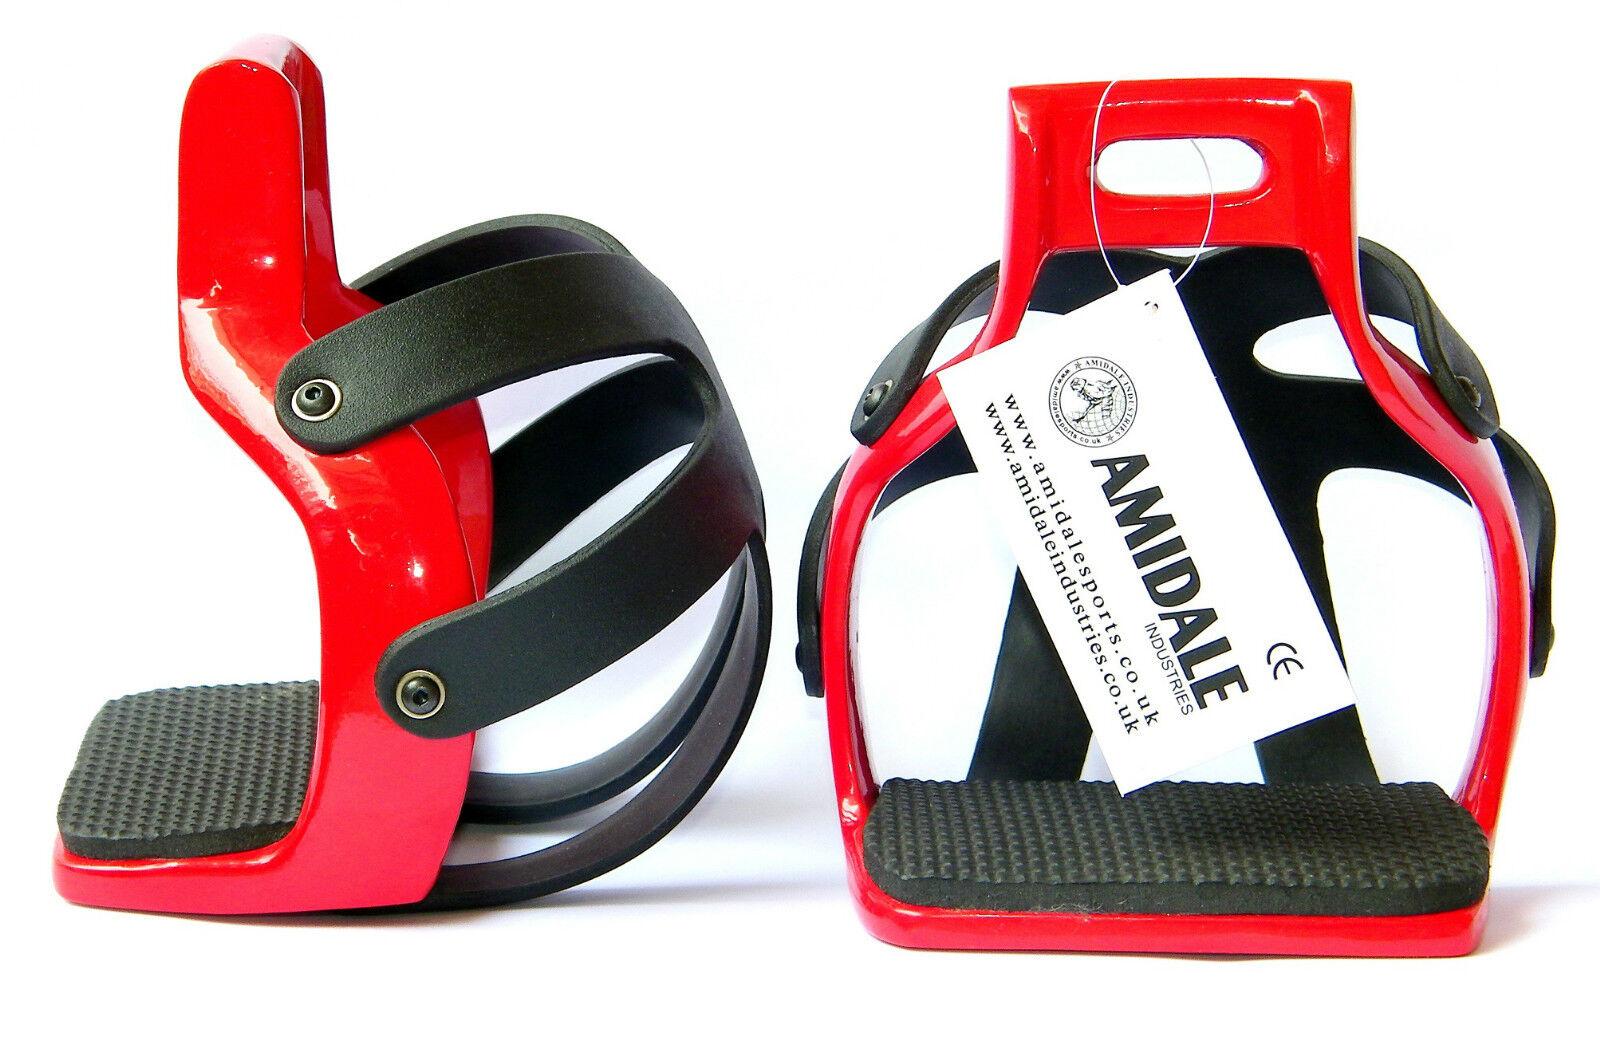 AMIDALE ALUMINIUM ENDURANCE FLEX RIDE CAGED SAFETY HORSE STIRRUPS RED COLOR